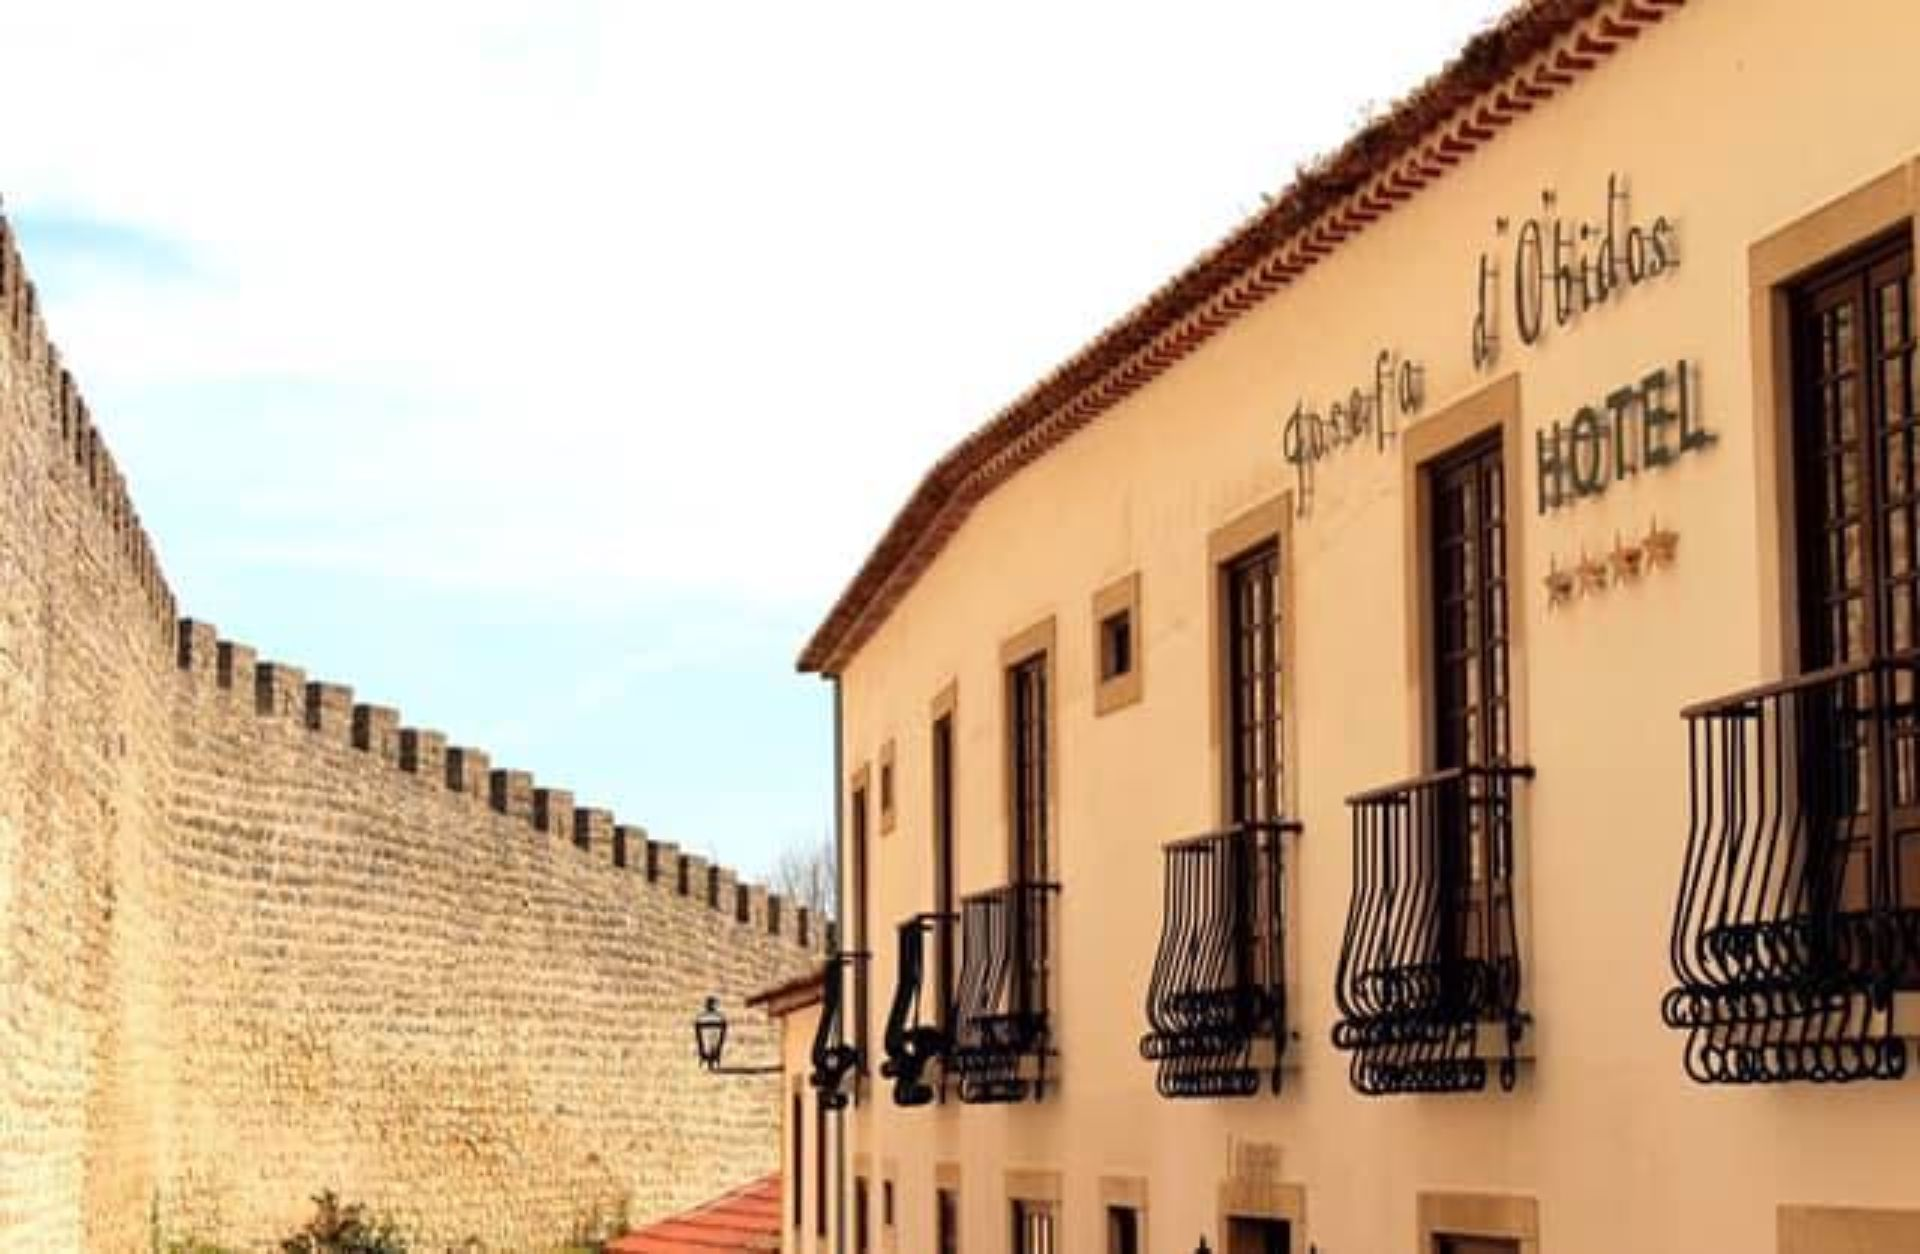 Josefa Obidos Hotel